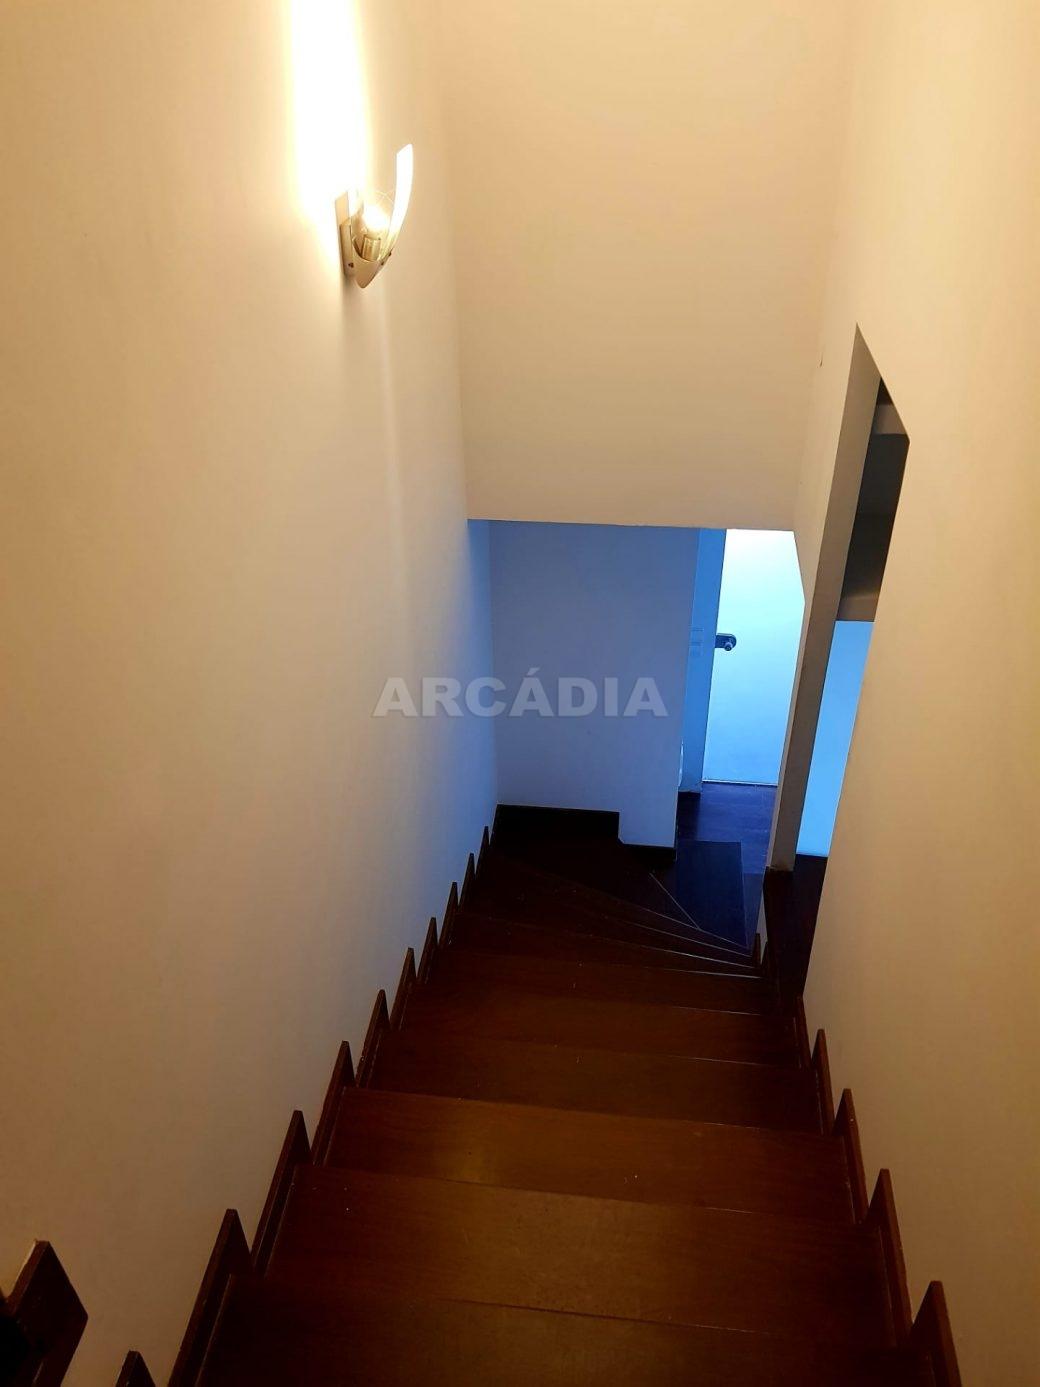 arcadia-imobiliaria-moradia-3665-524